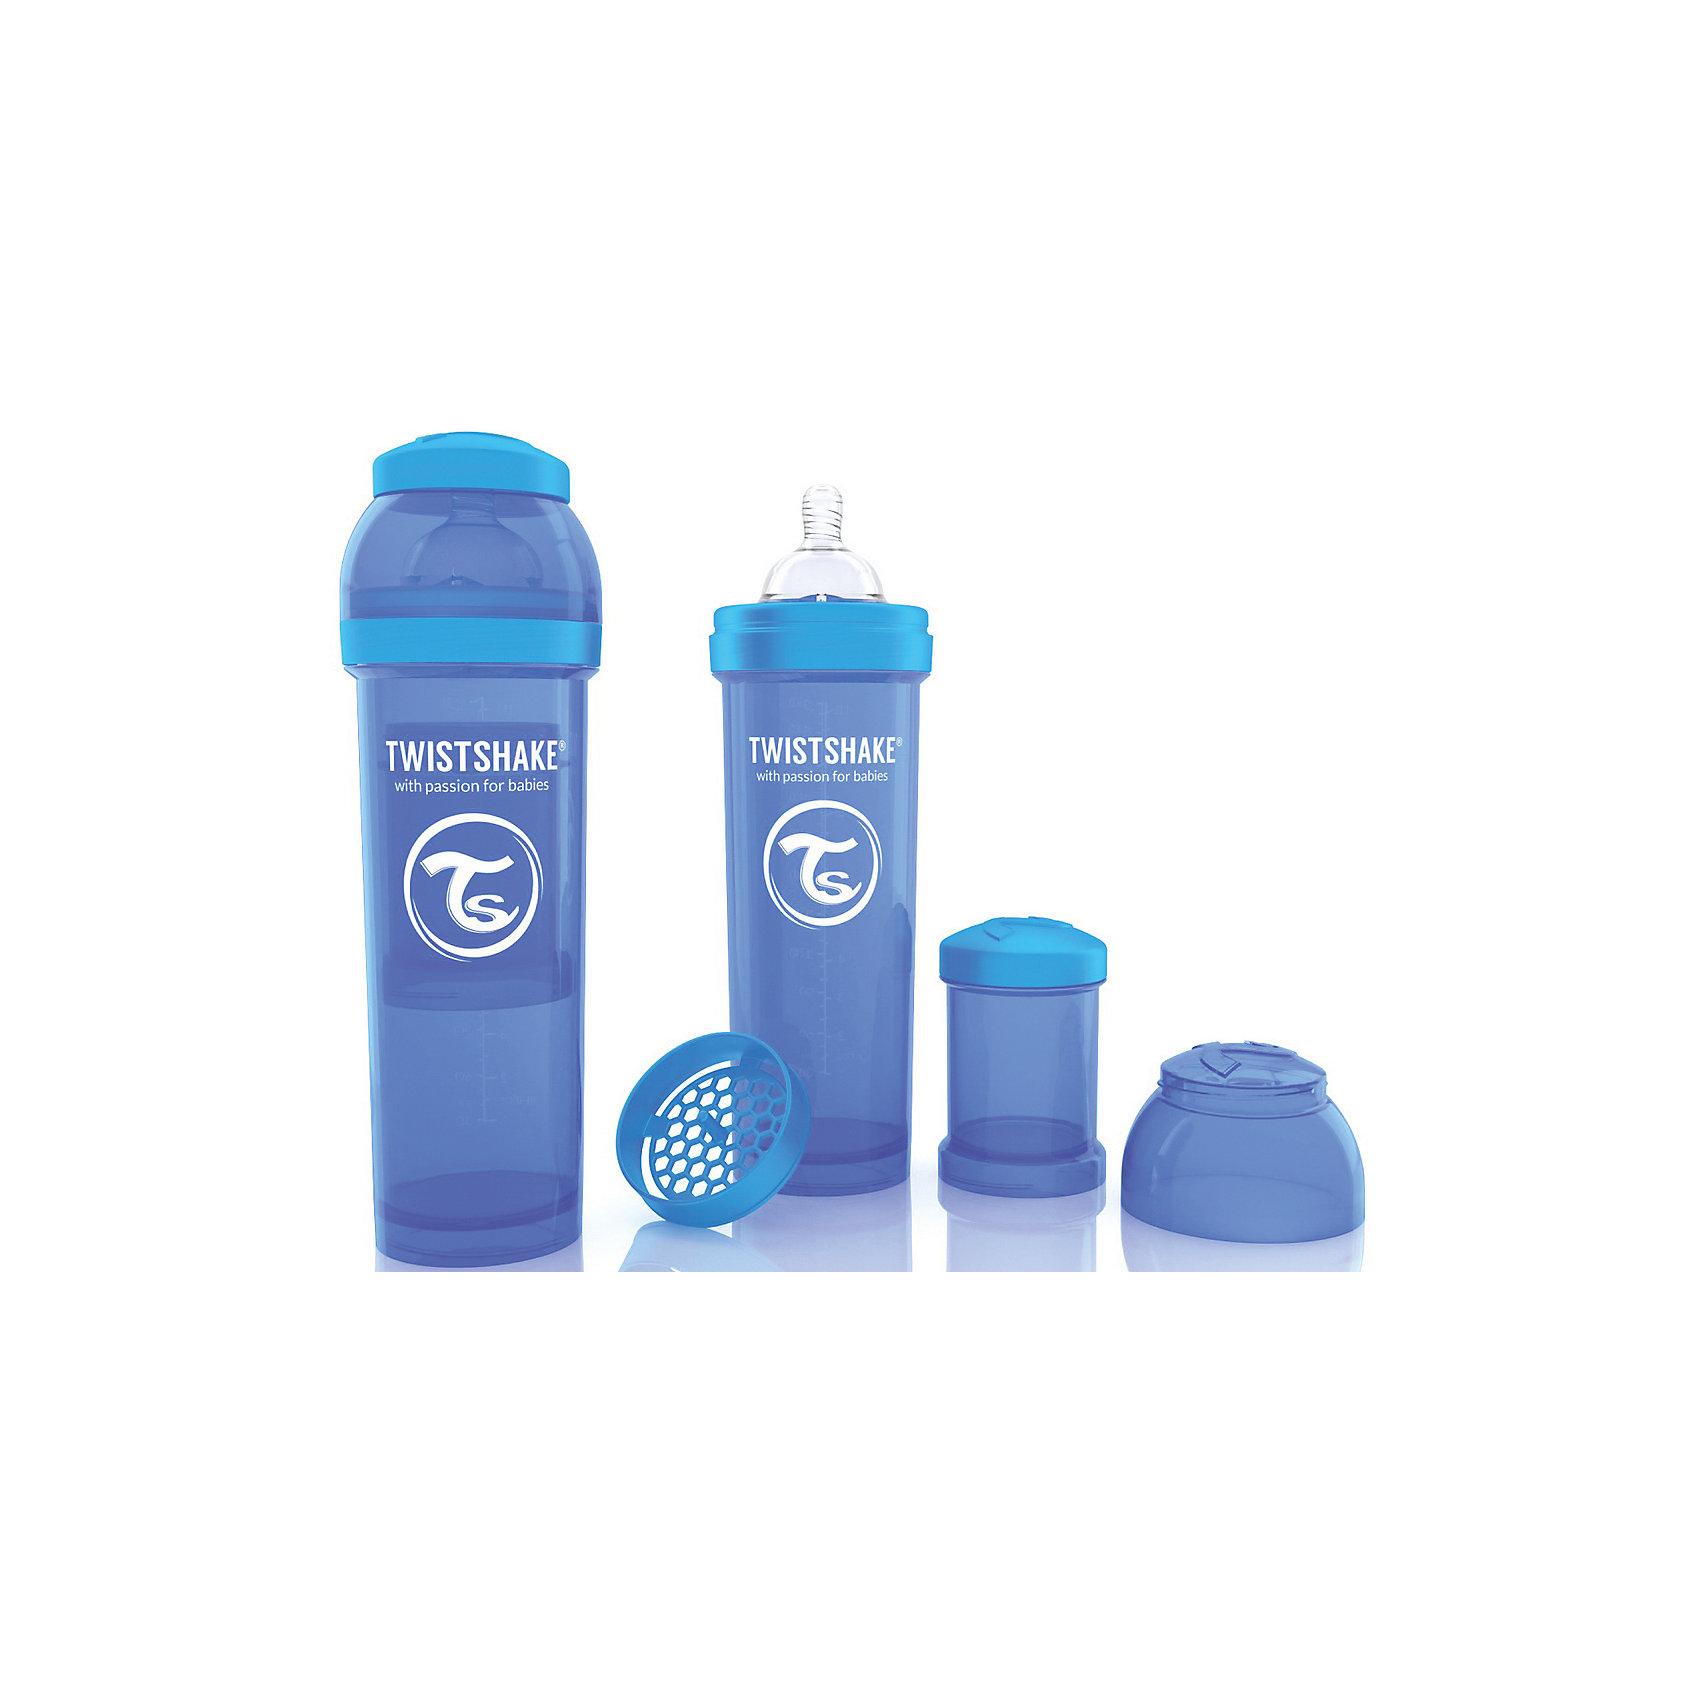 Twistshake Антиколиковая бутылочка 330 мл., Twistshake, синий шарк 330 купить в украике